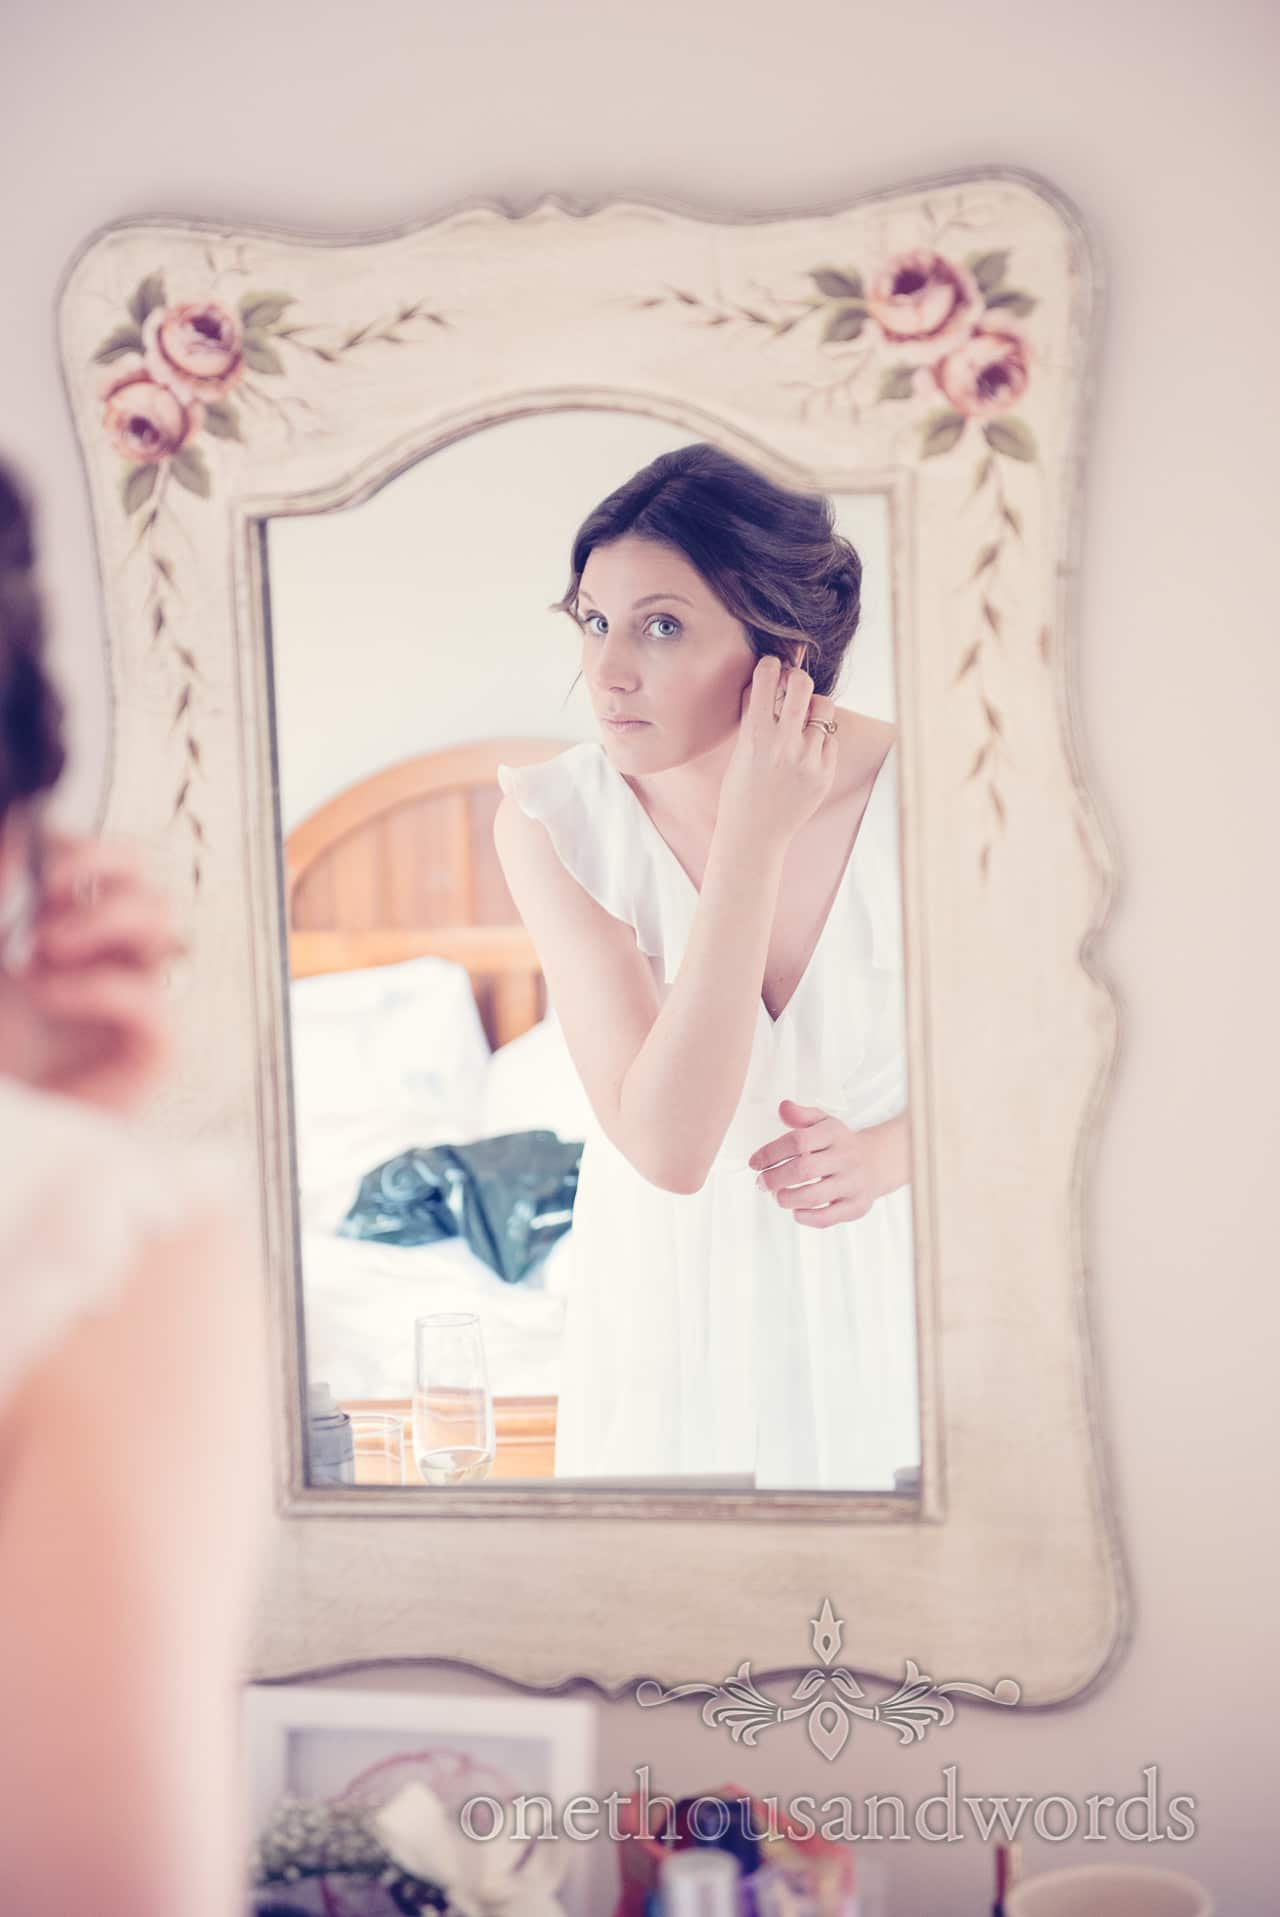 Bridesmaid looks in mirror during wedding morning preparations